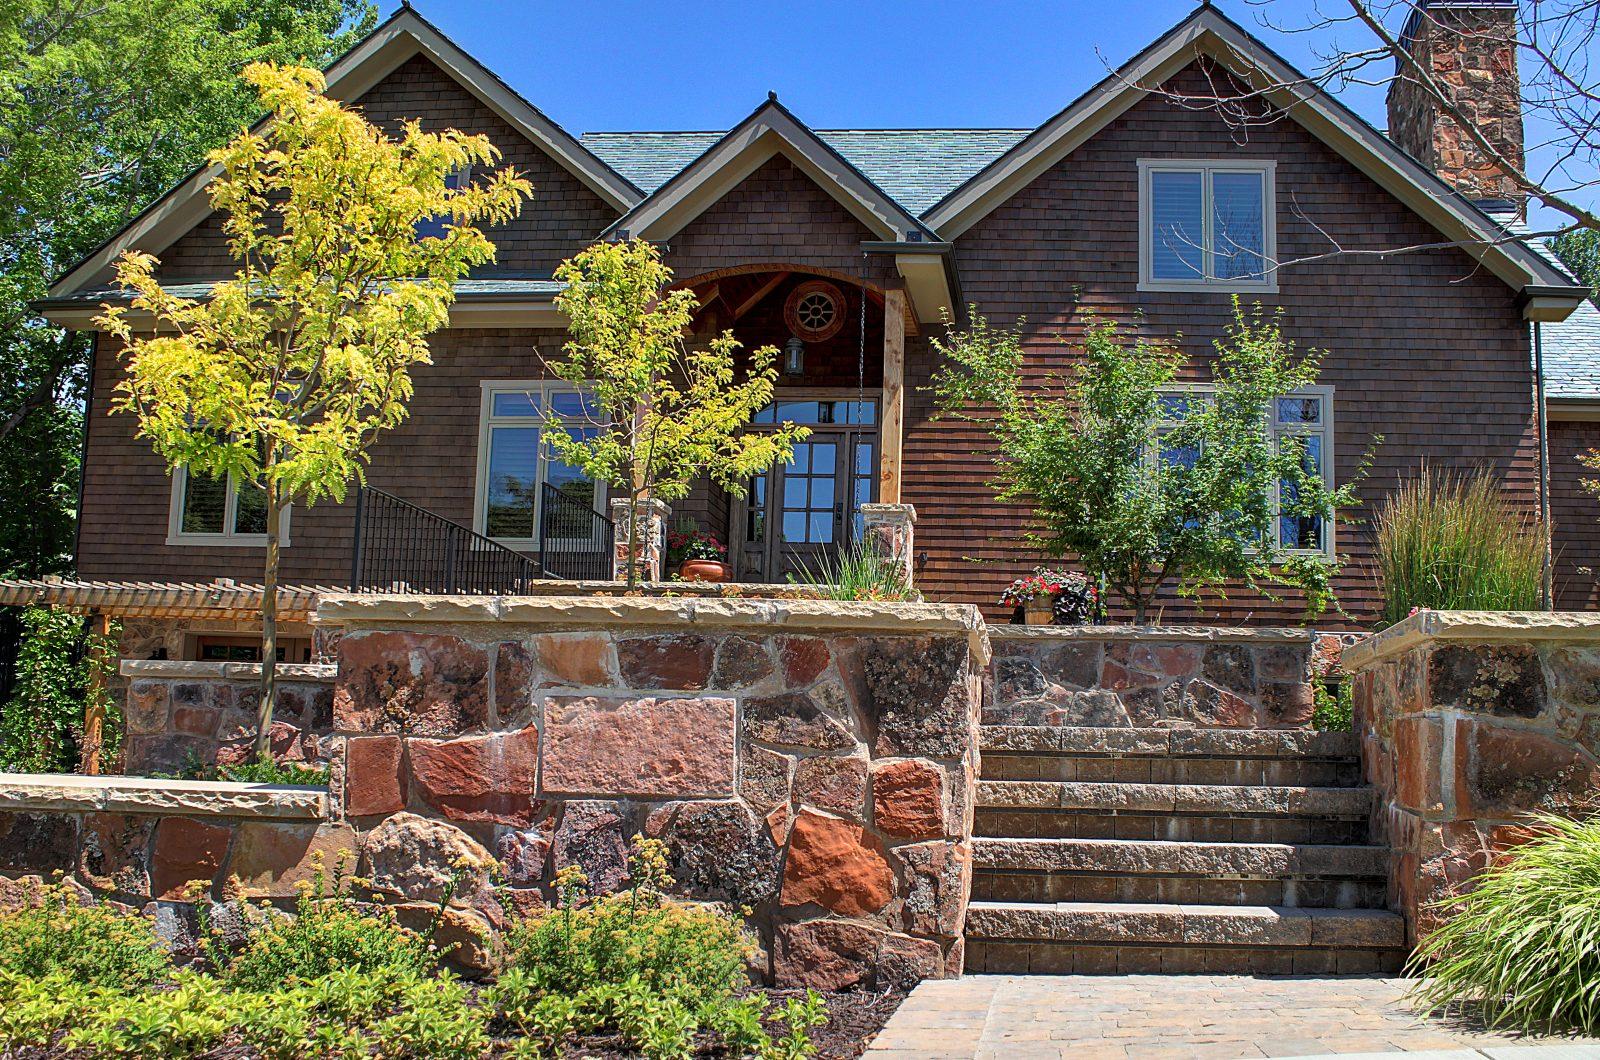 After_Exterior-Home_Front-Porch-Designs_Home-Renovation   Renovation Design Group